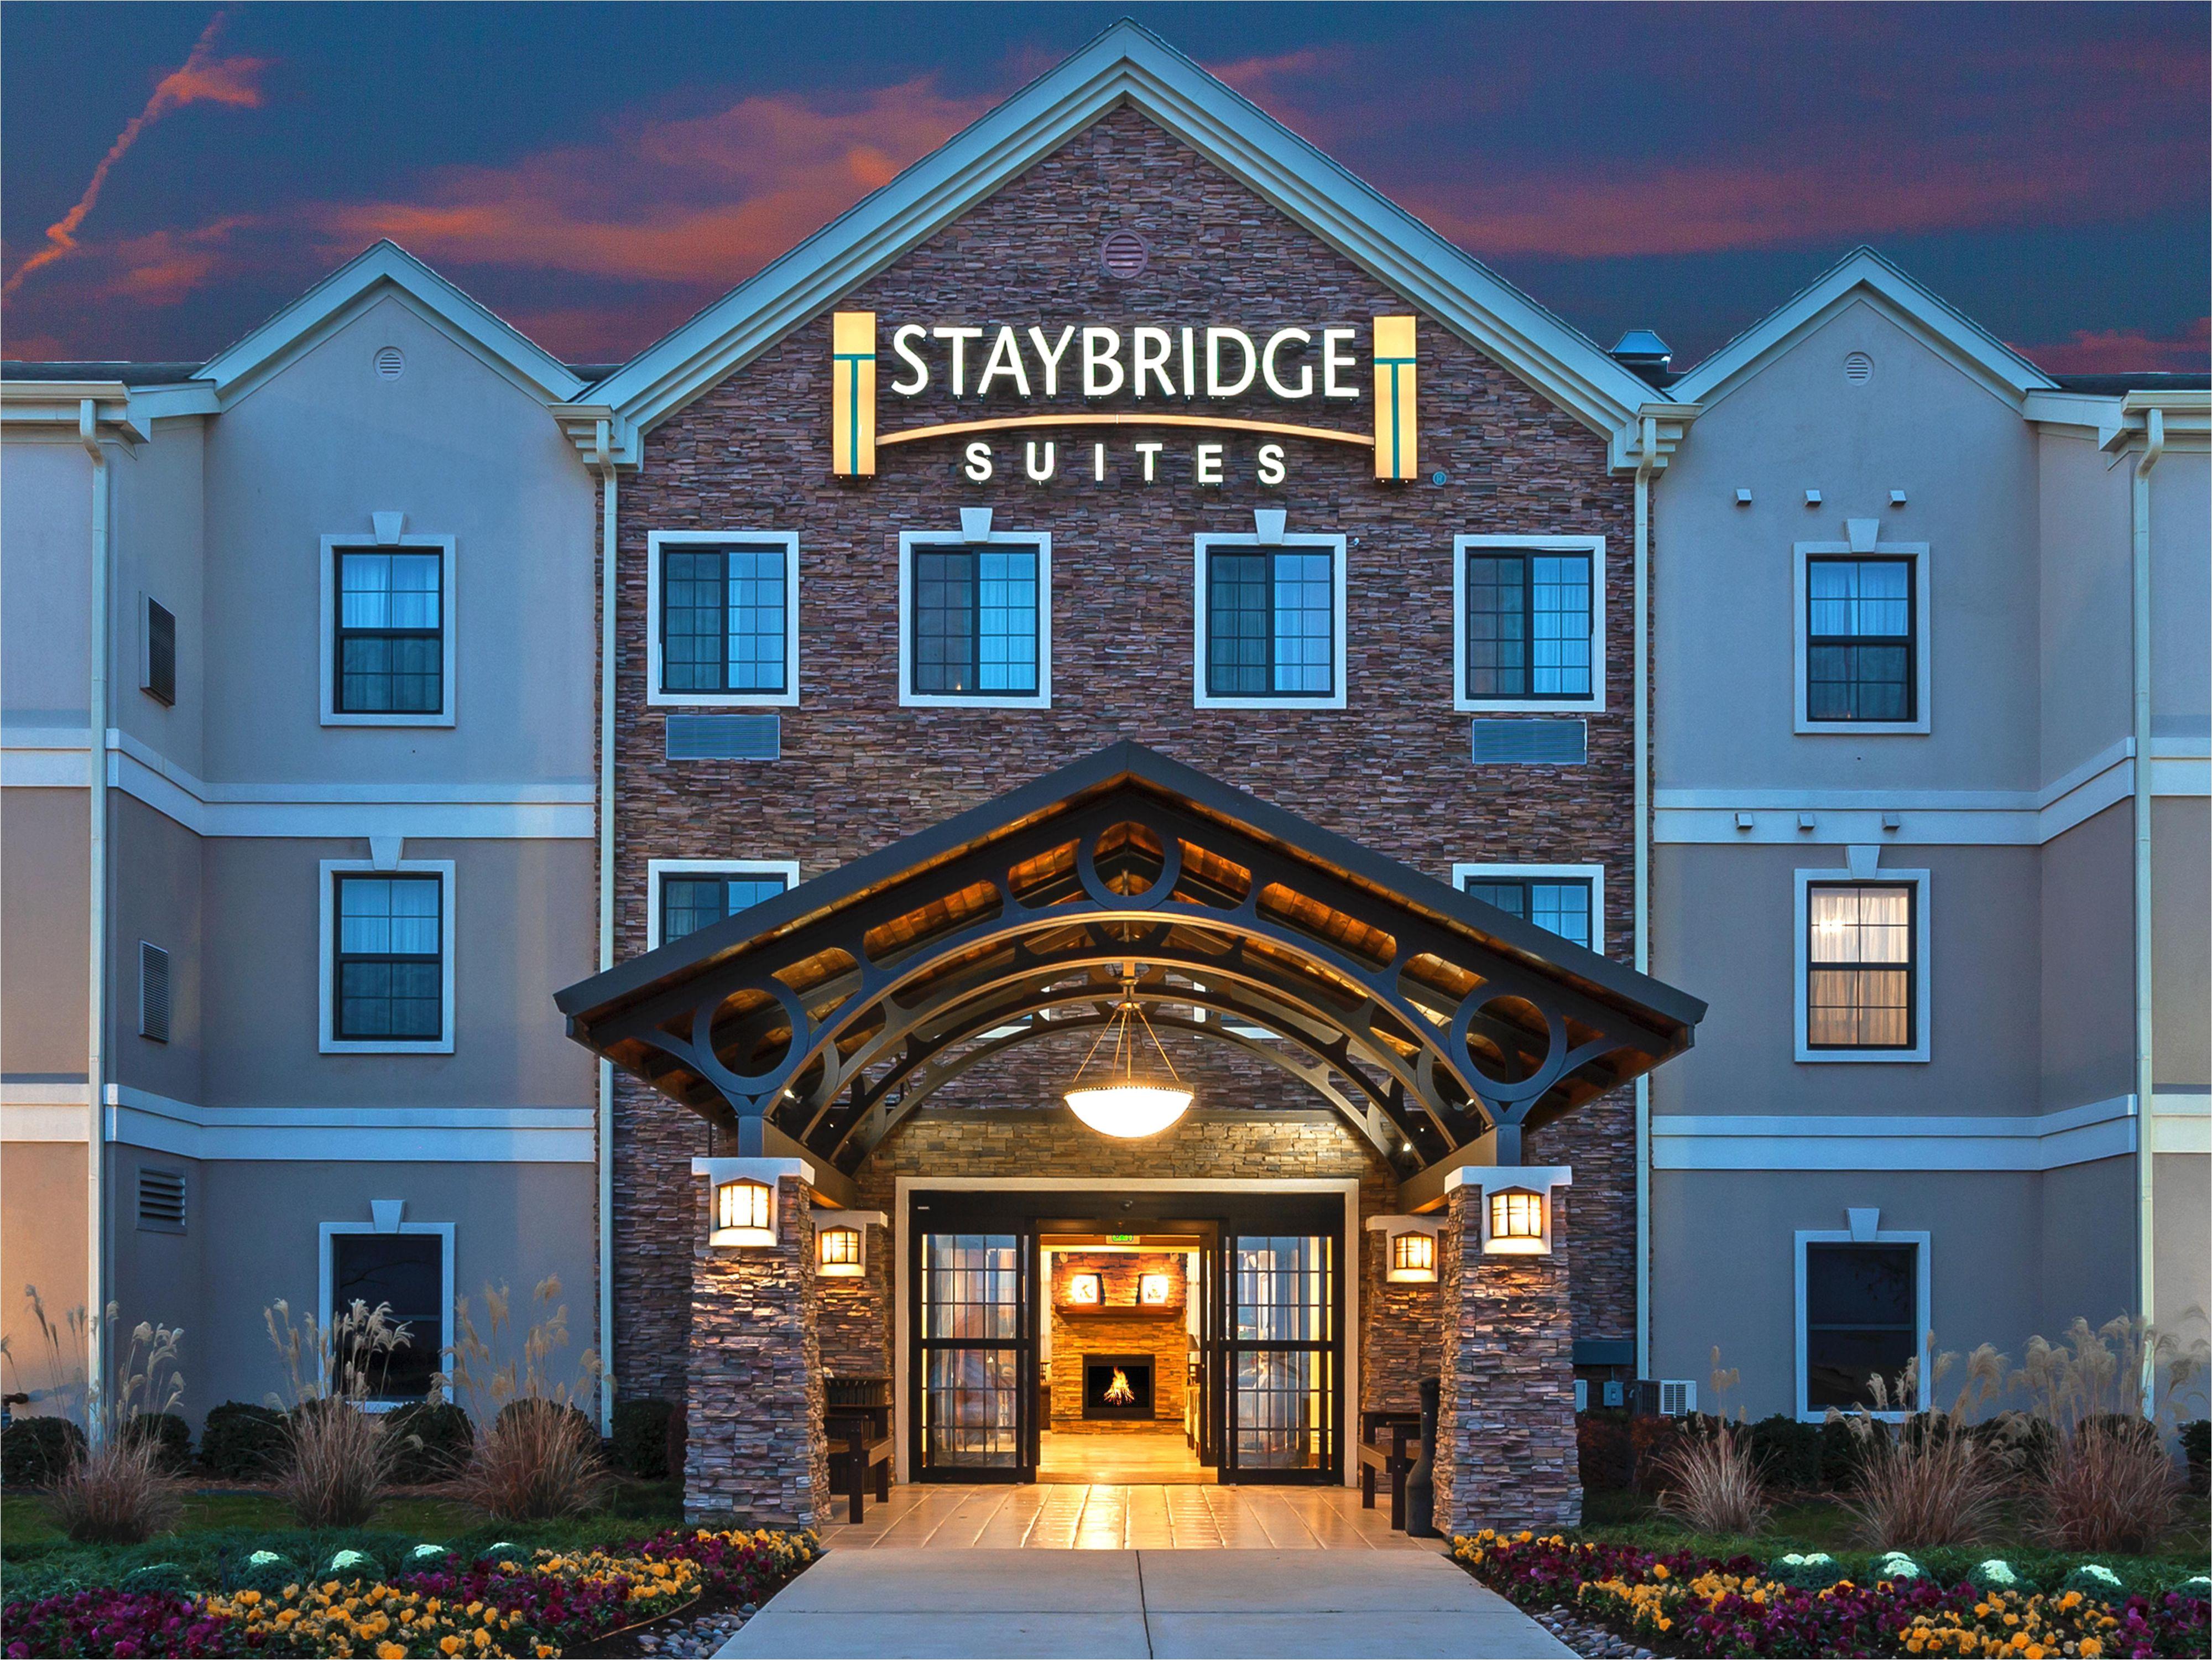 staybridge suites fort worth 3494489746 4x3